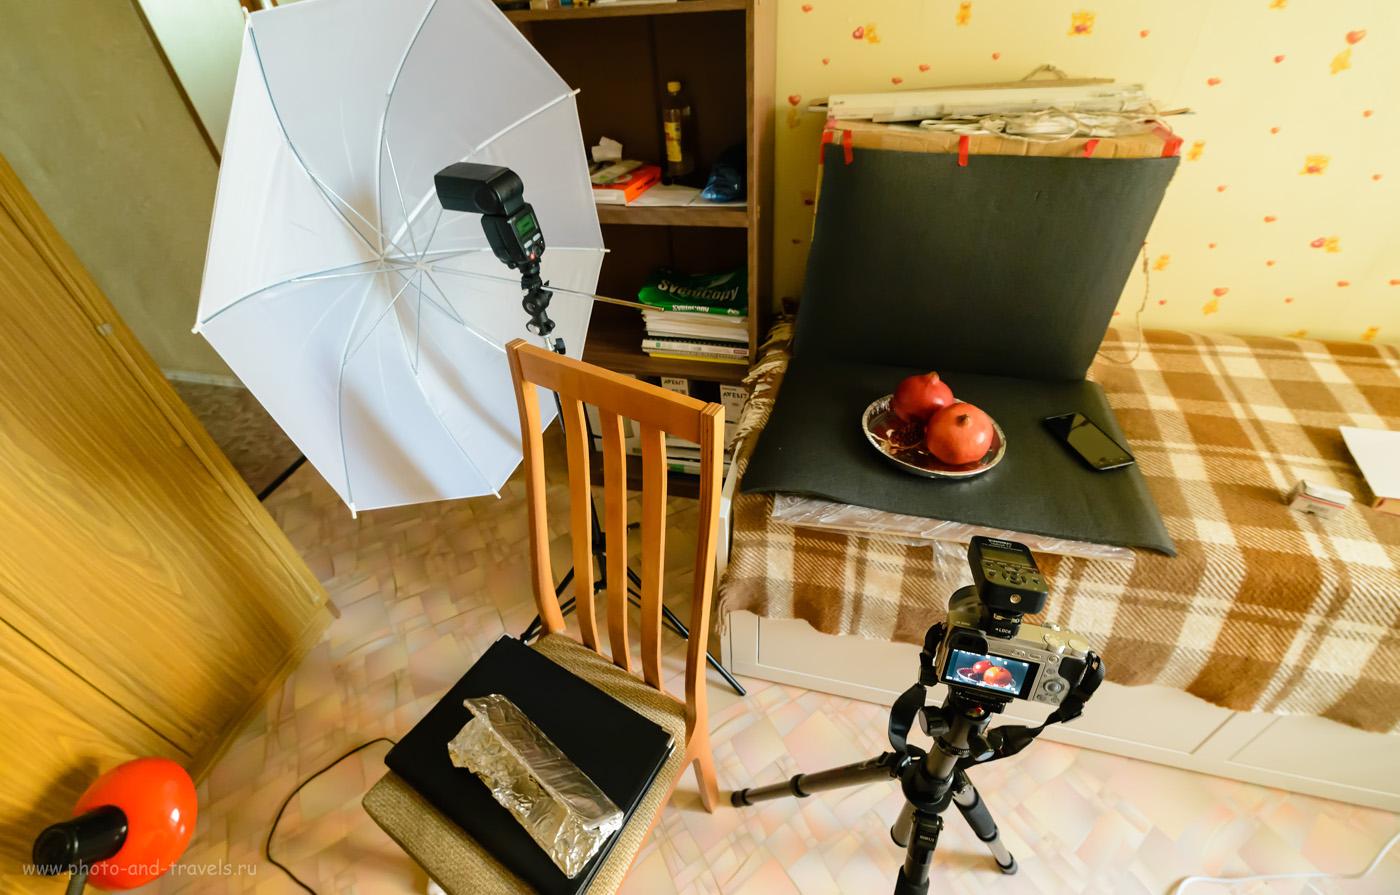 Фото 6. Домашняя студия для съемки натюрморта. Камера Sony A6000 KIT 16-50mm f/3.5-5.6 с переходником Pixel TF-334 установлена на штатив Sirui T-2204X с головой G-20KX. Слева – вспышка Yongnuo YN-685N на стойке с белым зонтом Vitrox. Все кадры с бэкстейджа получены на Nikon D610 + ширик Samyang 14mm f/2.8. Настройки этого снимка: В=1/13 сек., экспокоррекция 0EV, f/5.6, ISO 6400, ФР=14 мм.